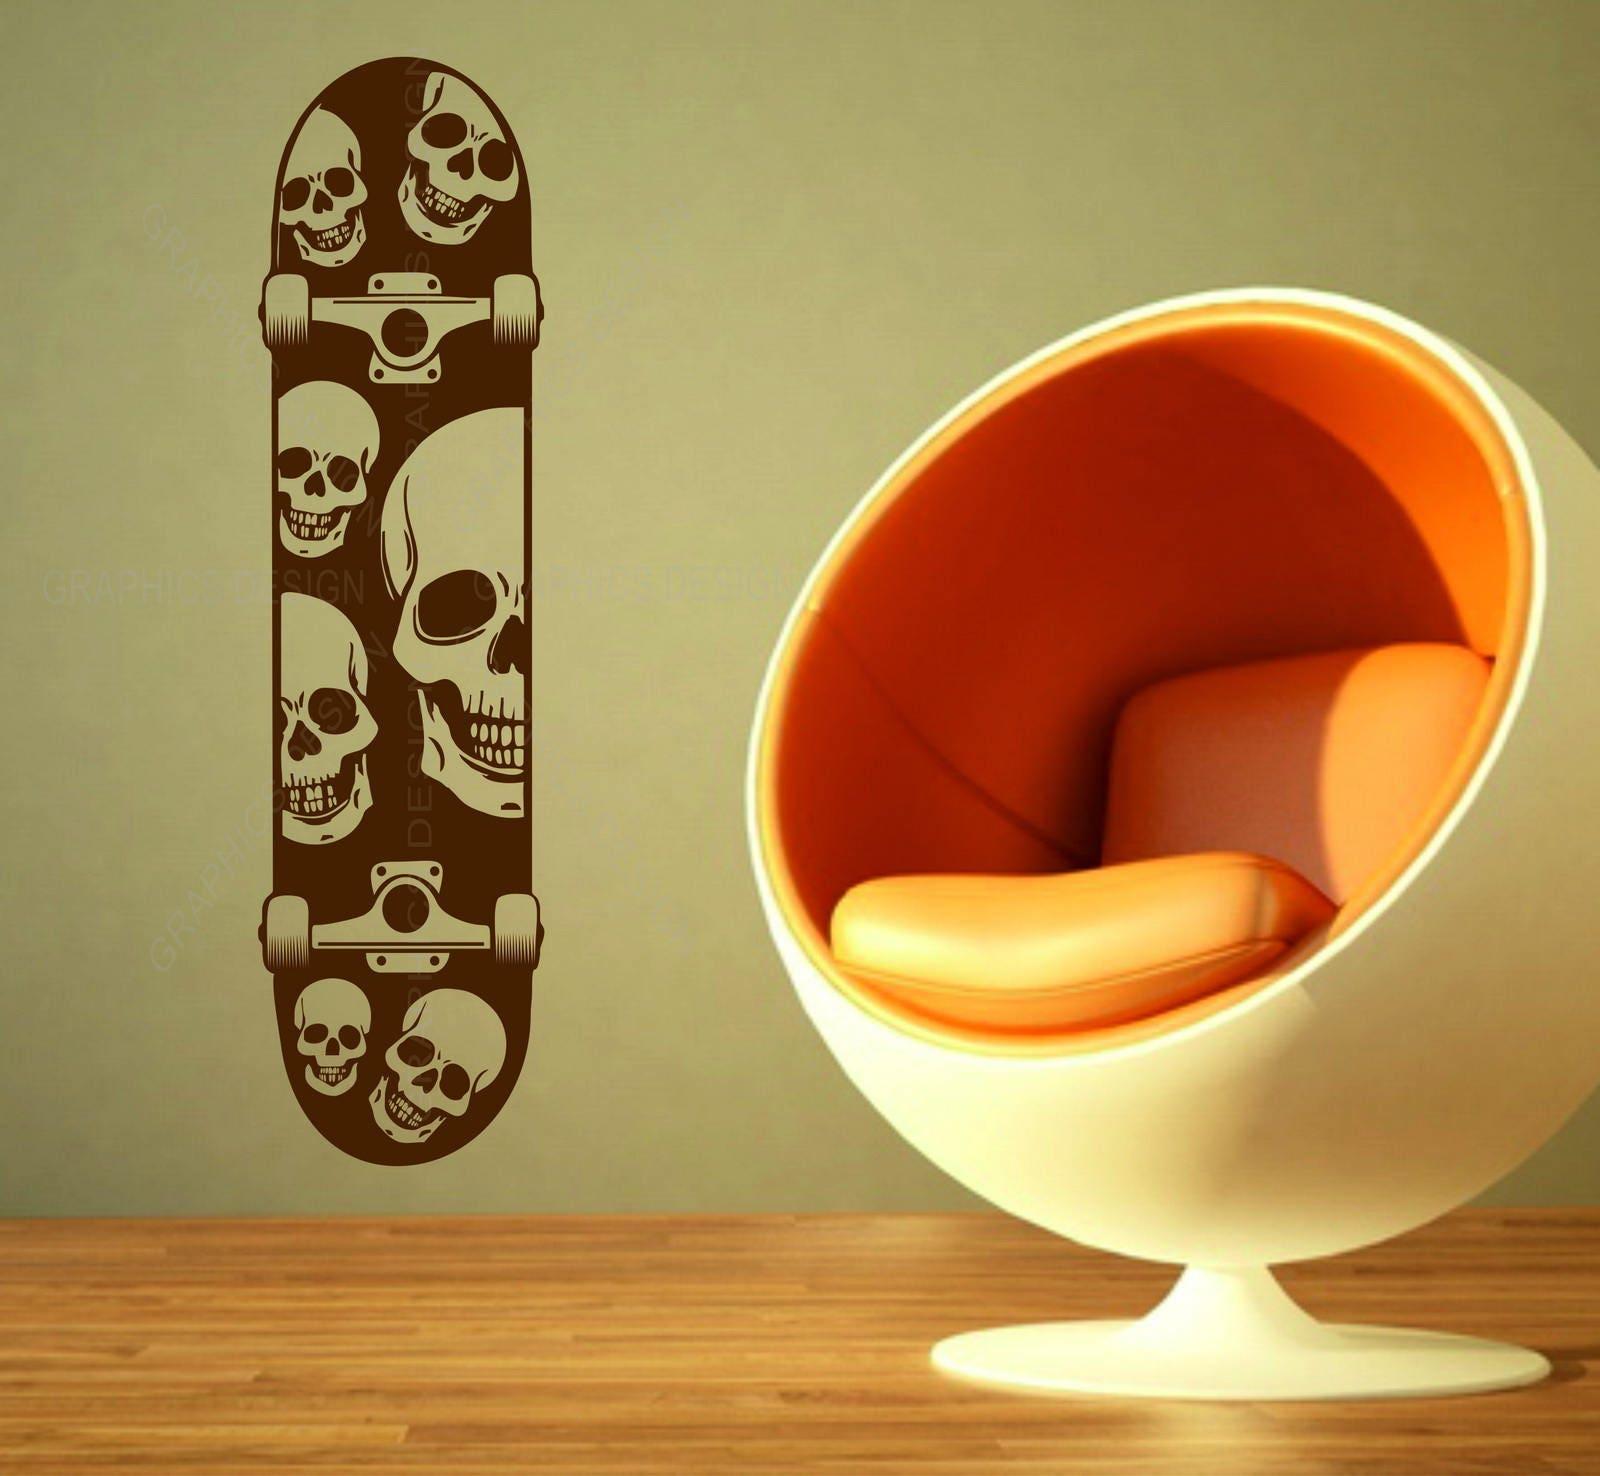 Skateboard Skeleton Skate Candy Sugar Skull Decor Vinyl Wall Sticker ...